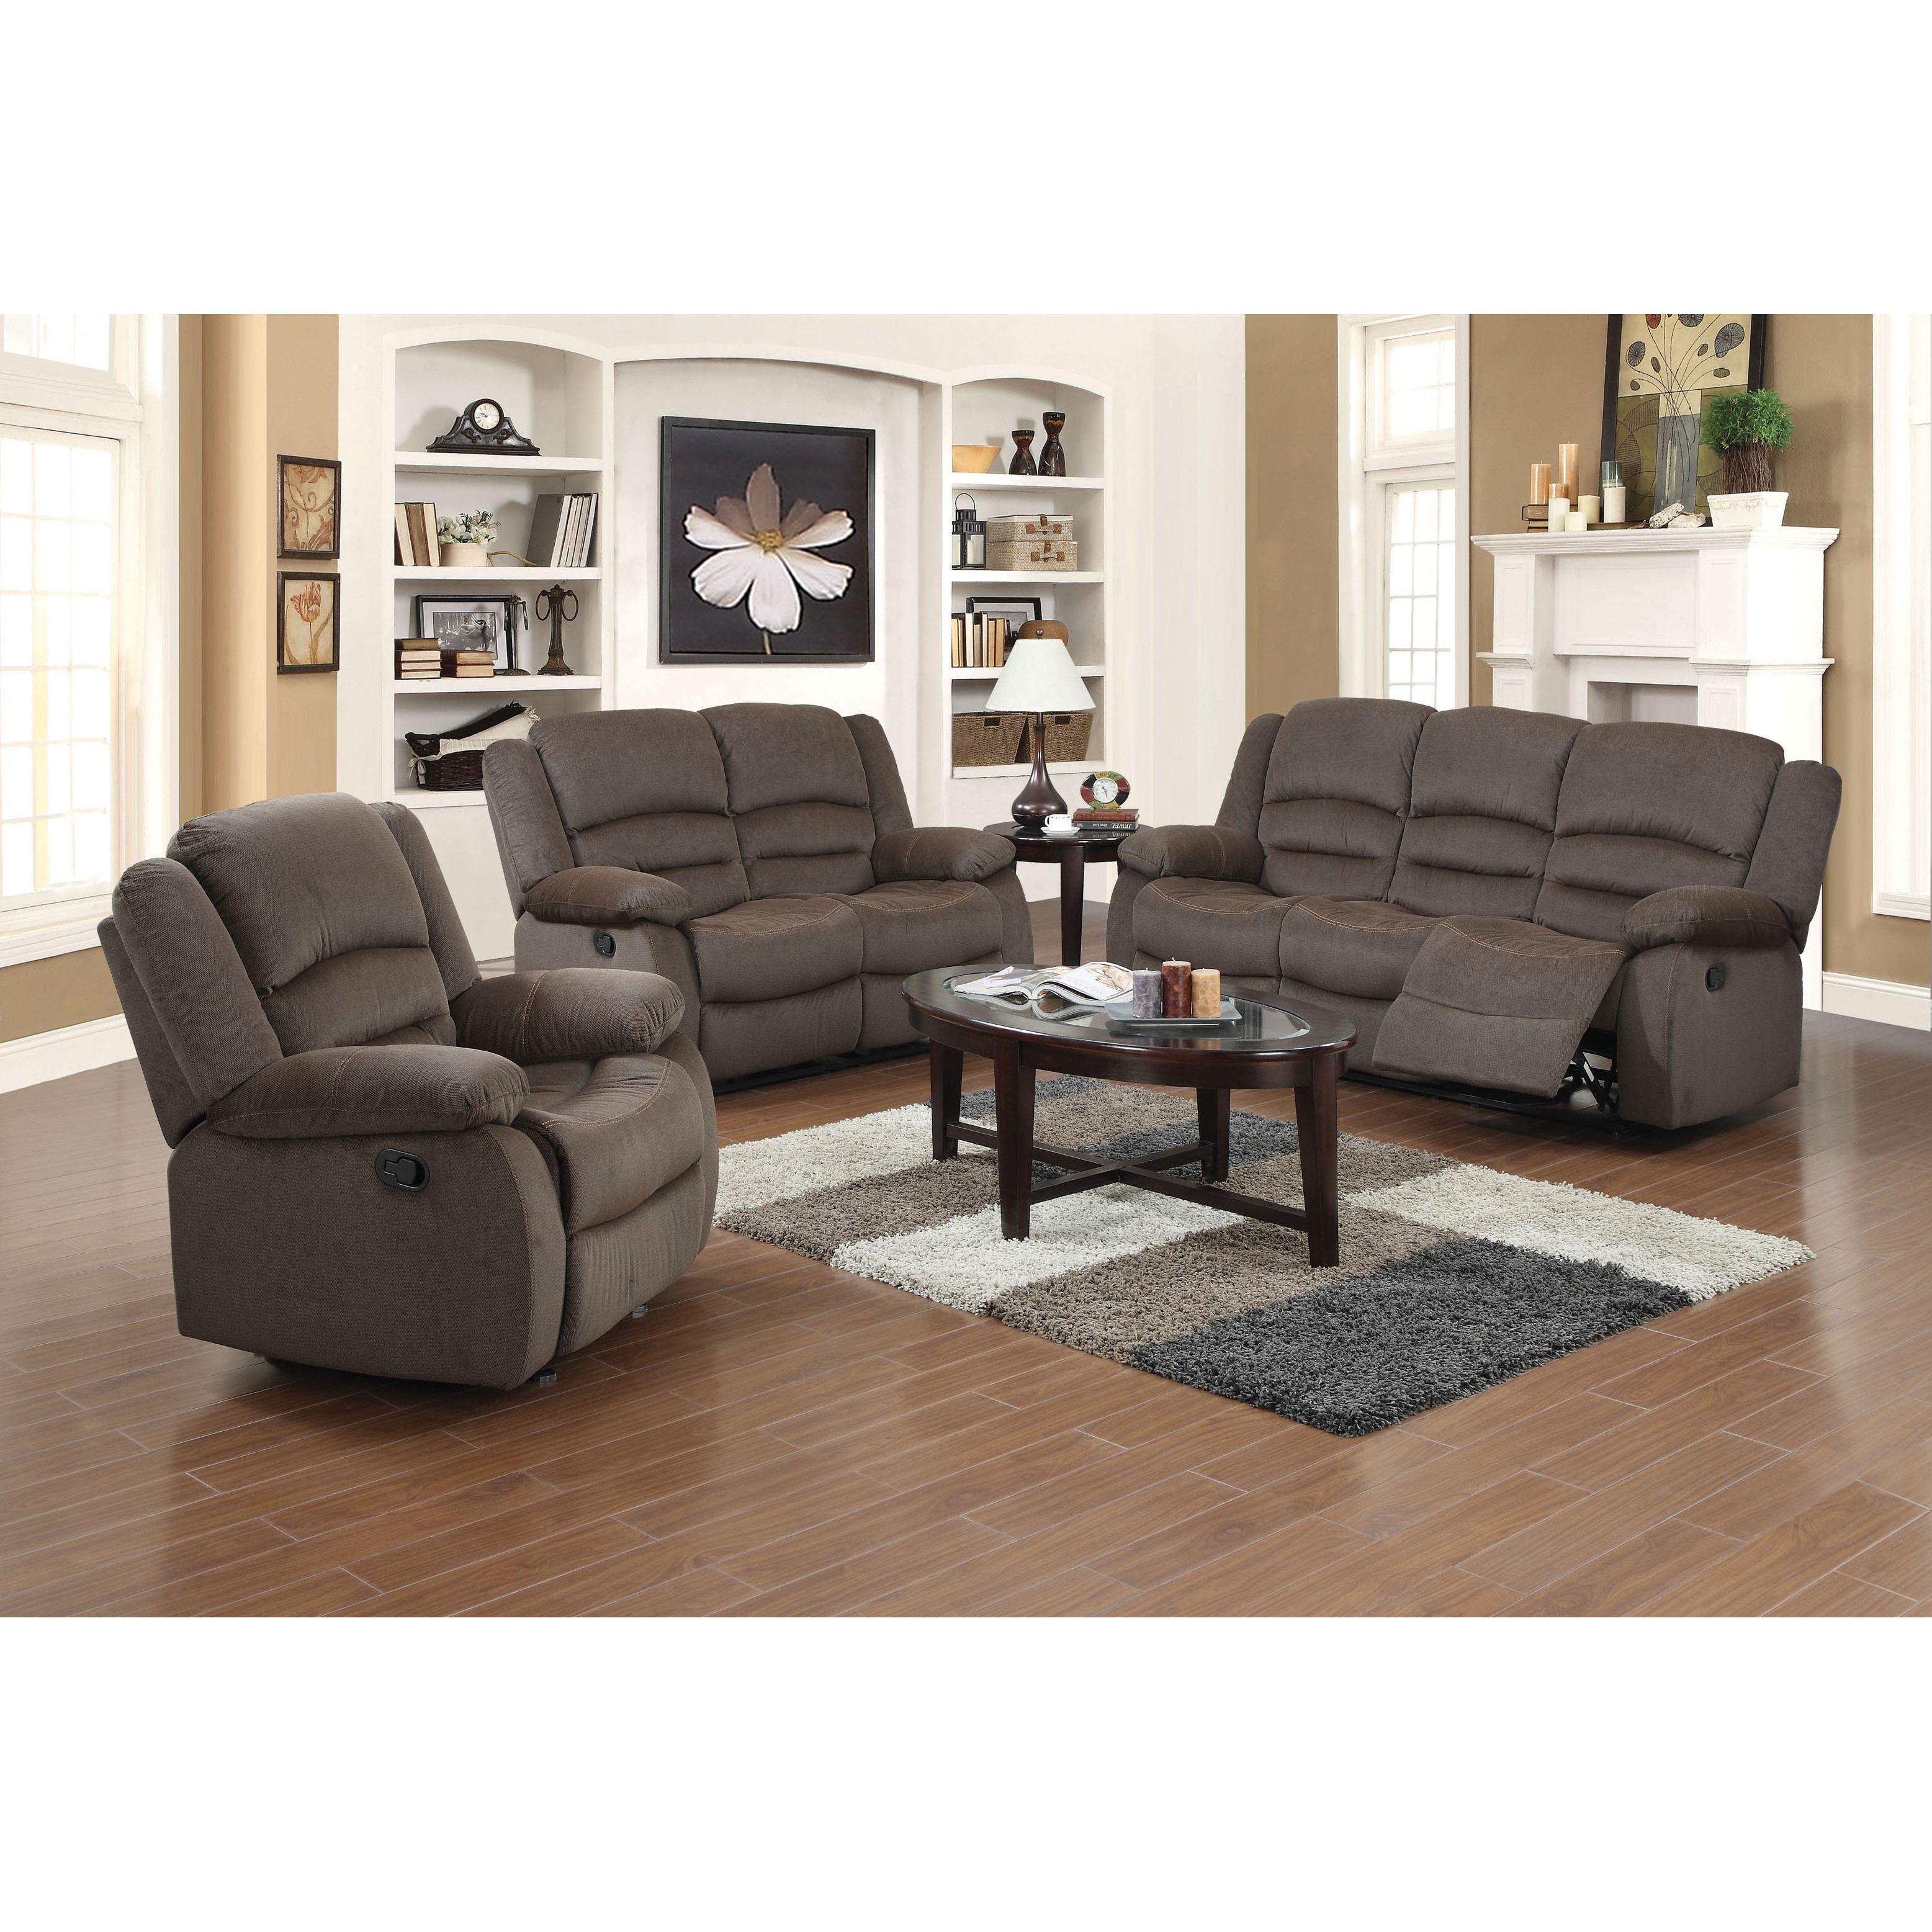 Us Pride Furniture Dallas 3 Piece Fabric Reclining Sofa Set Chocolate Brown